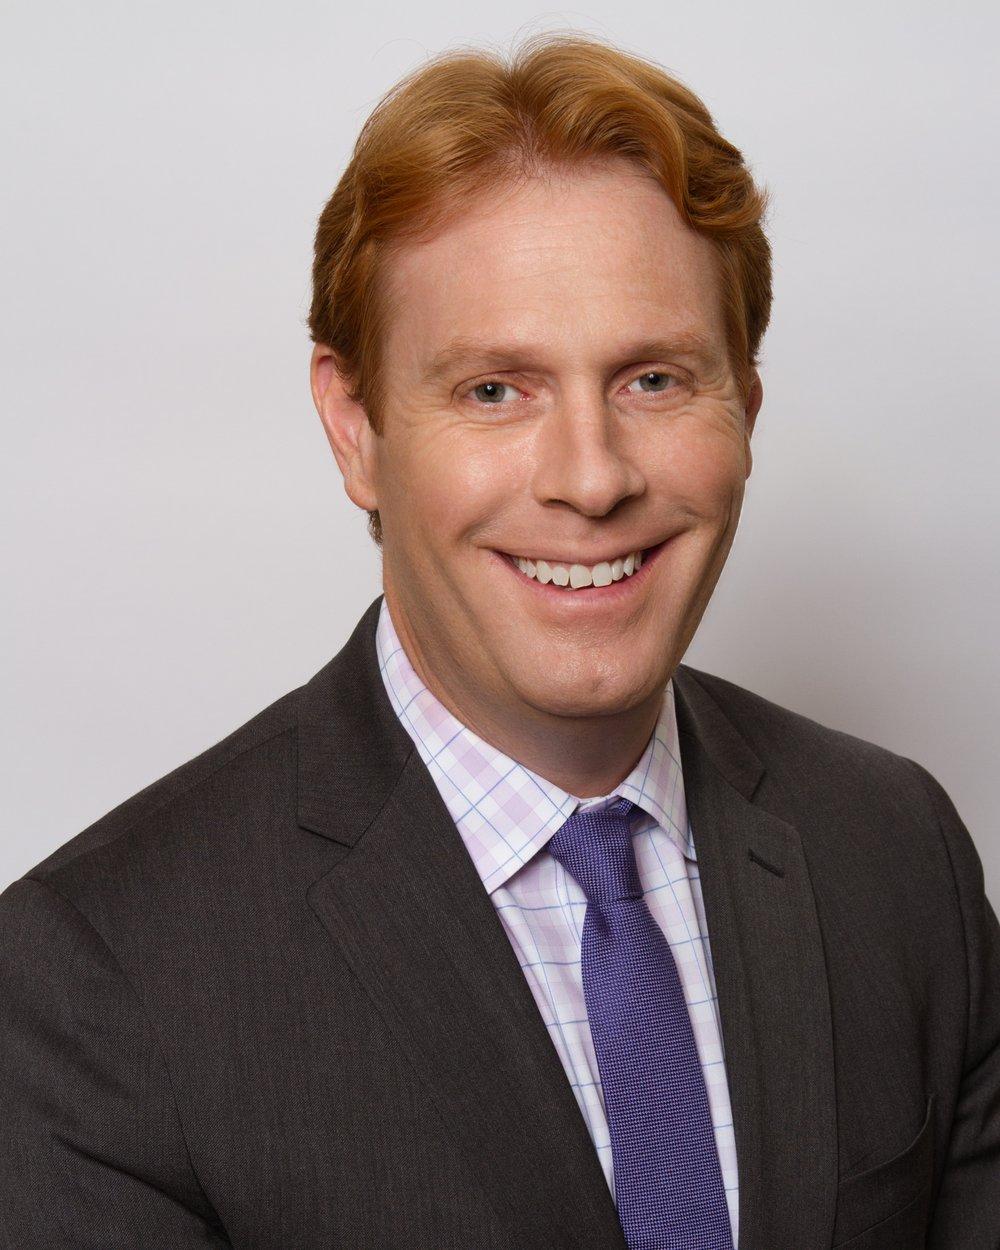 Jacob Udell (Toronto, CAN)